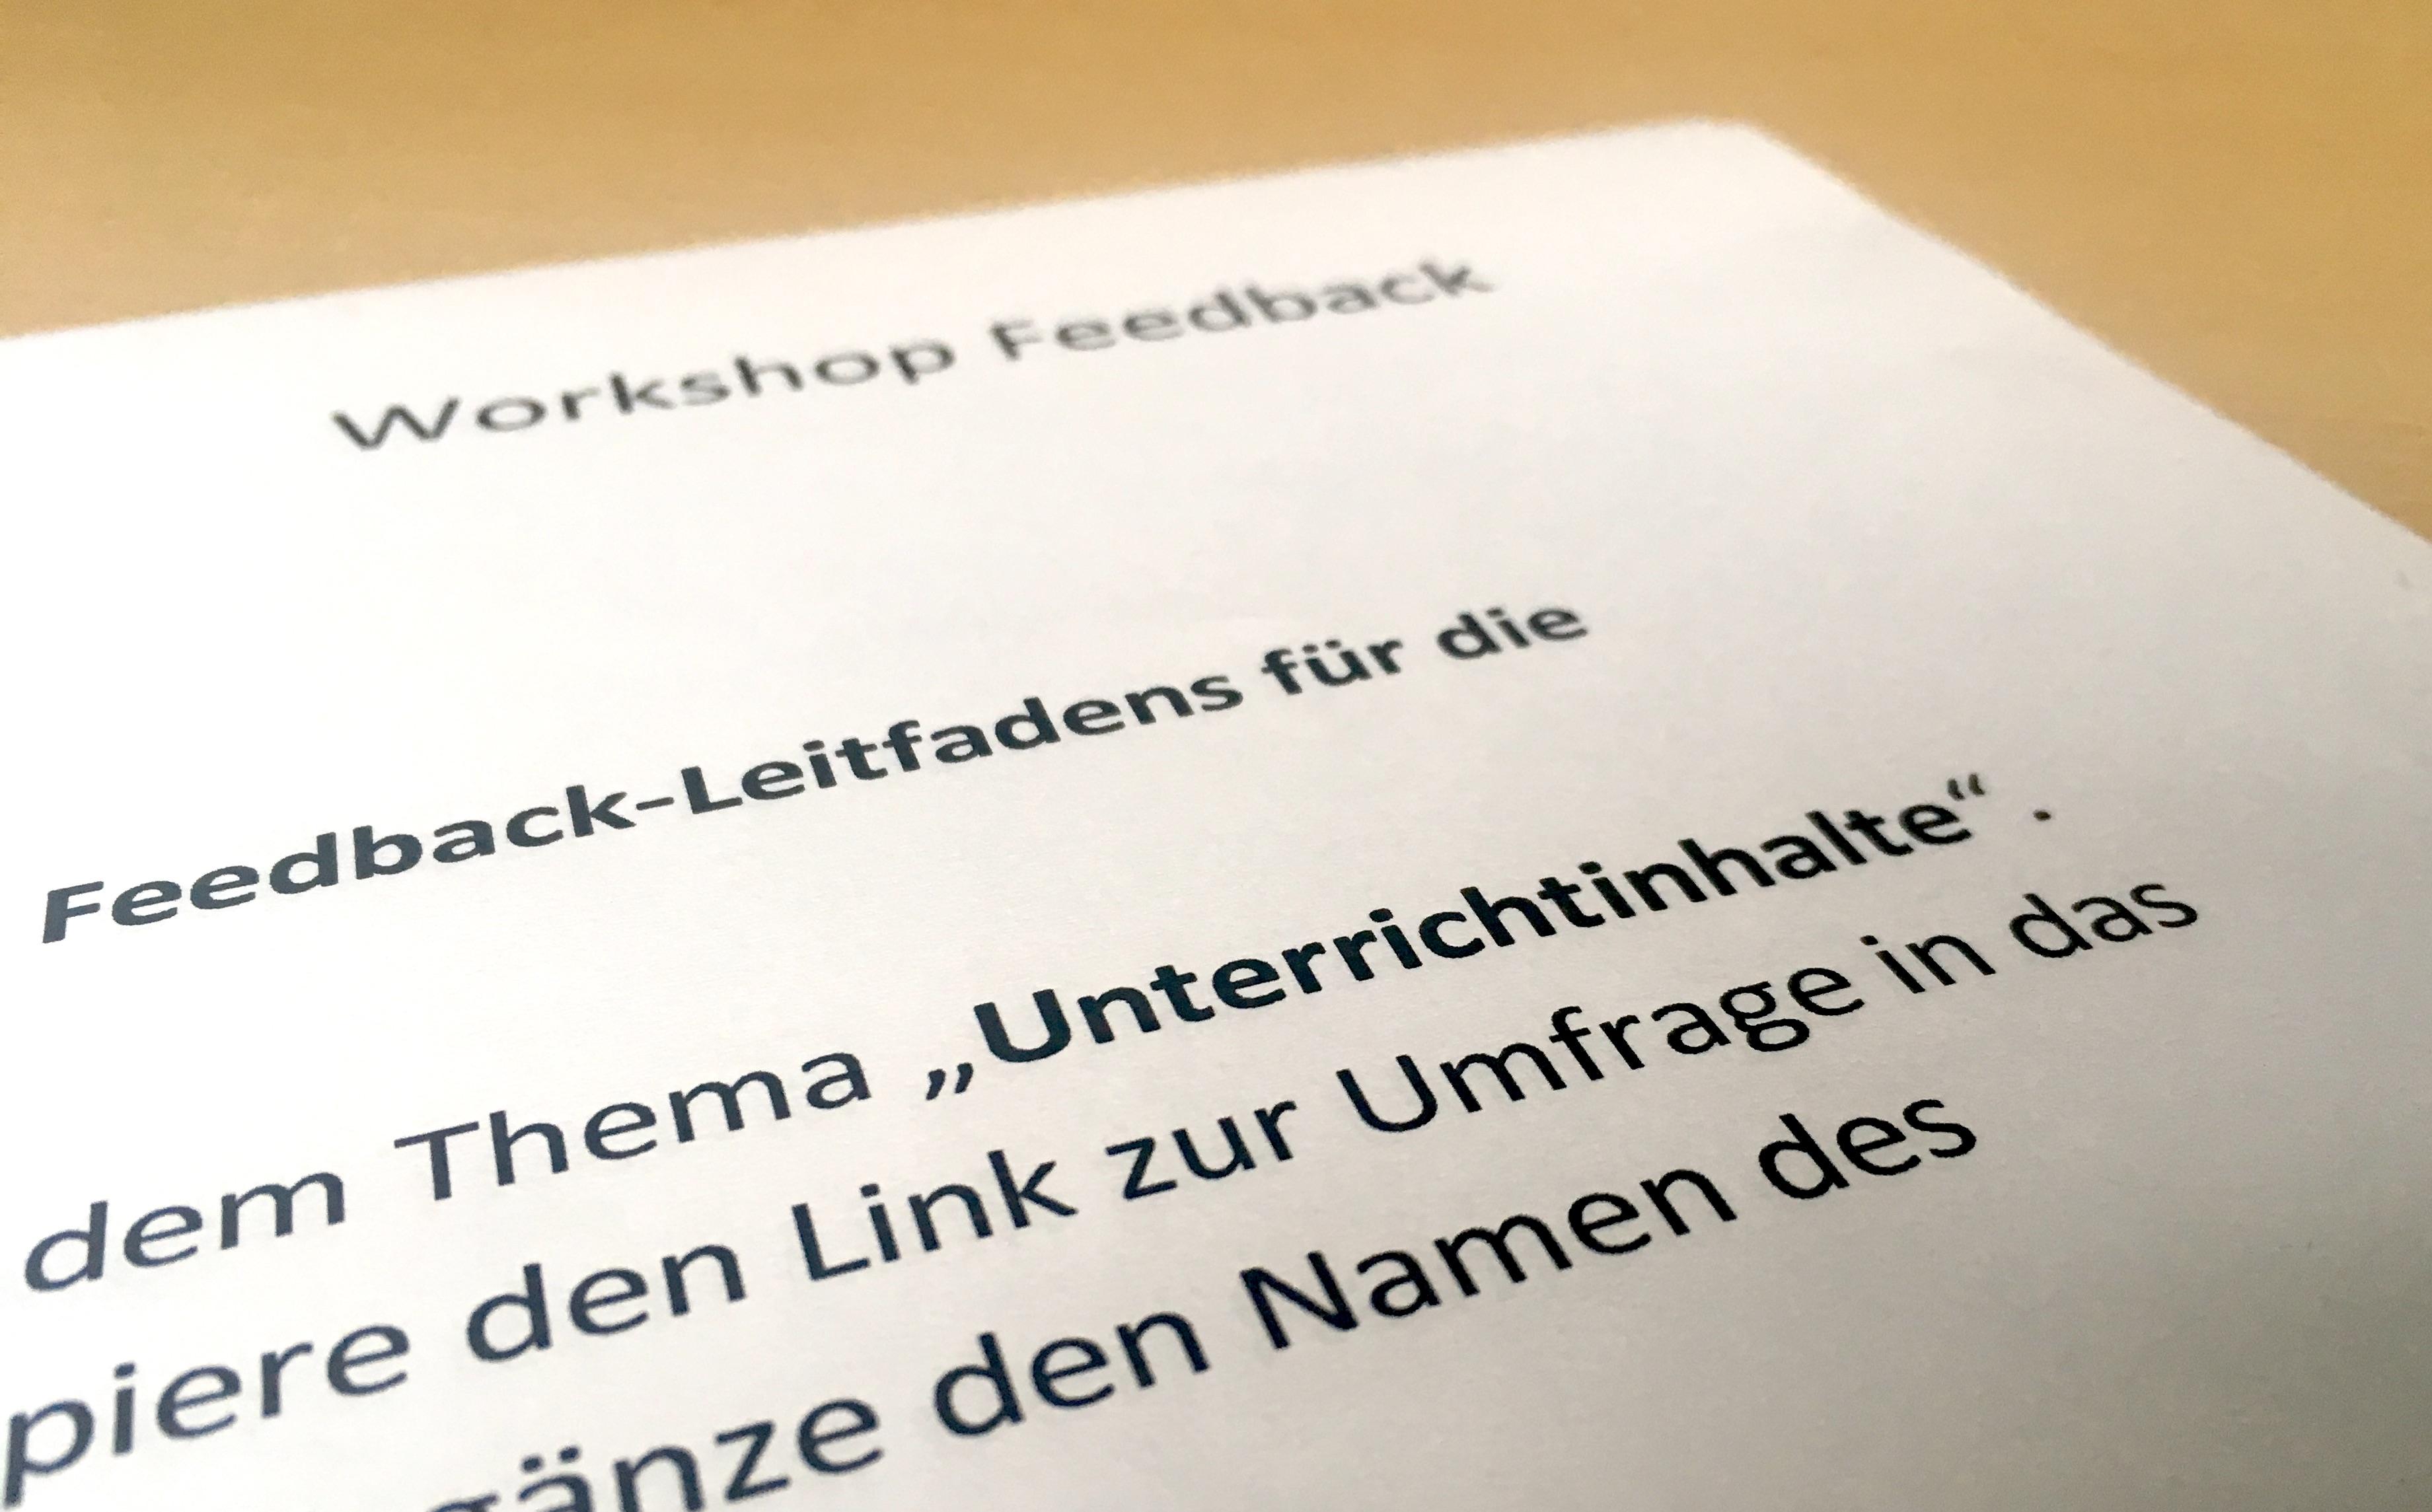 edkimo-workshop-feedback-unterrichtsinhalt